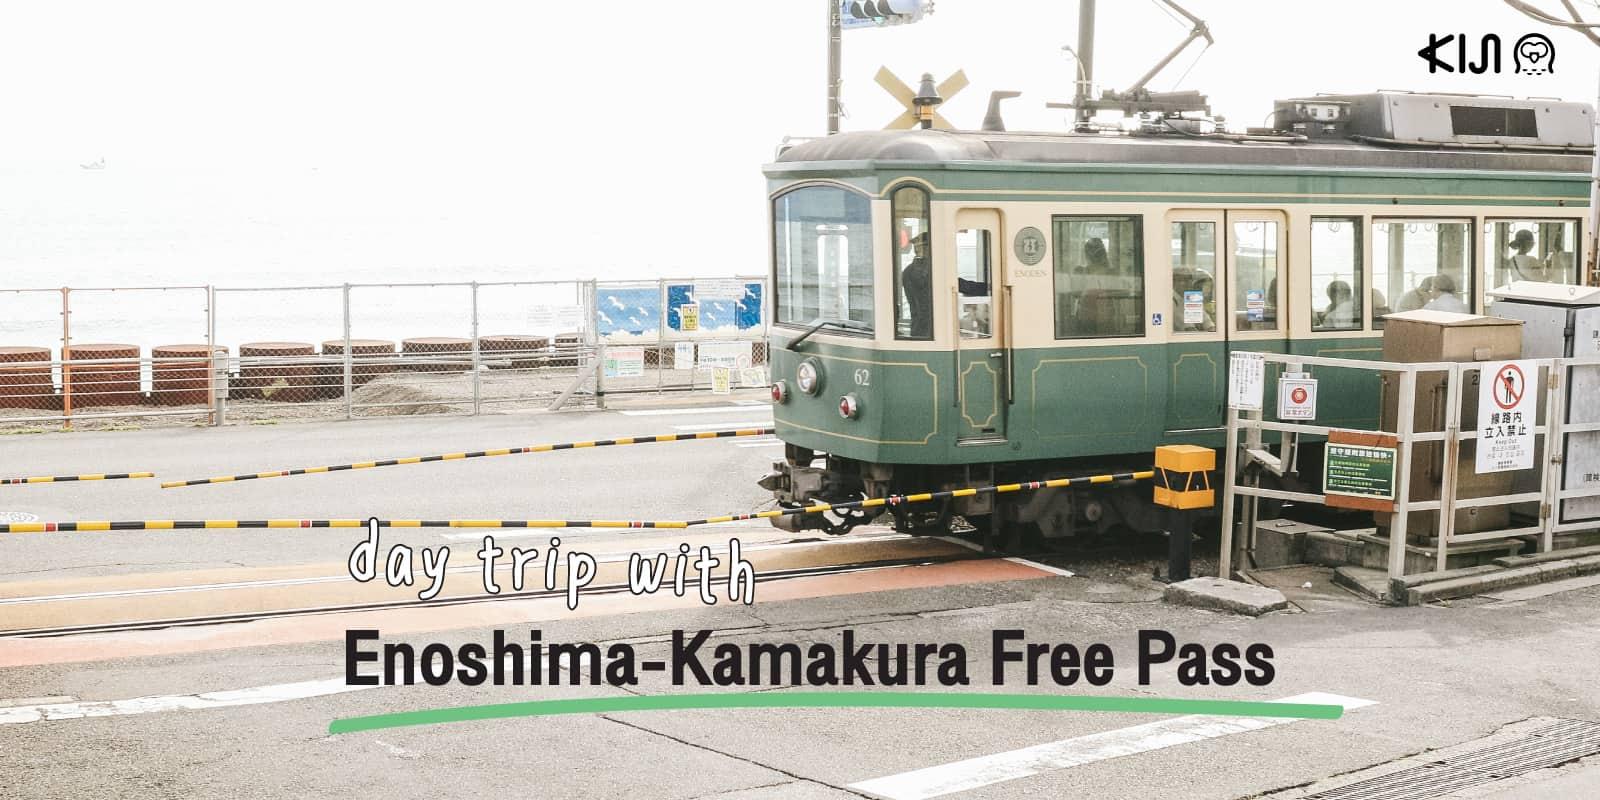 Enoshima-Kamakura Free Pass